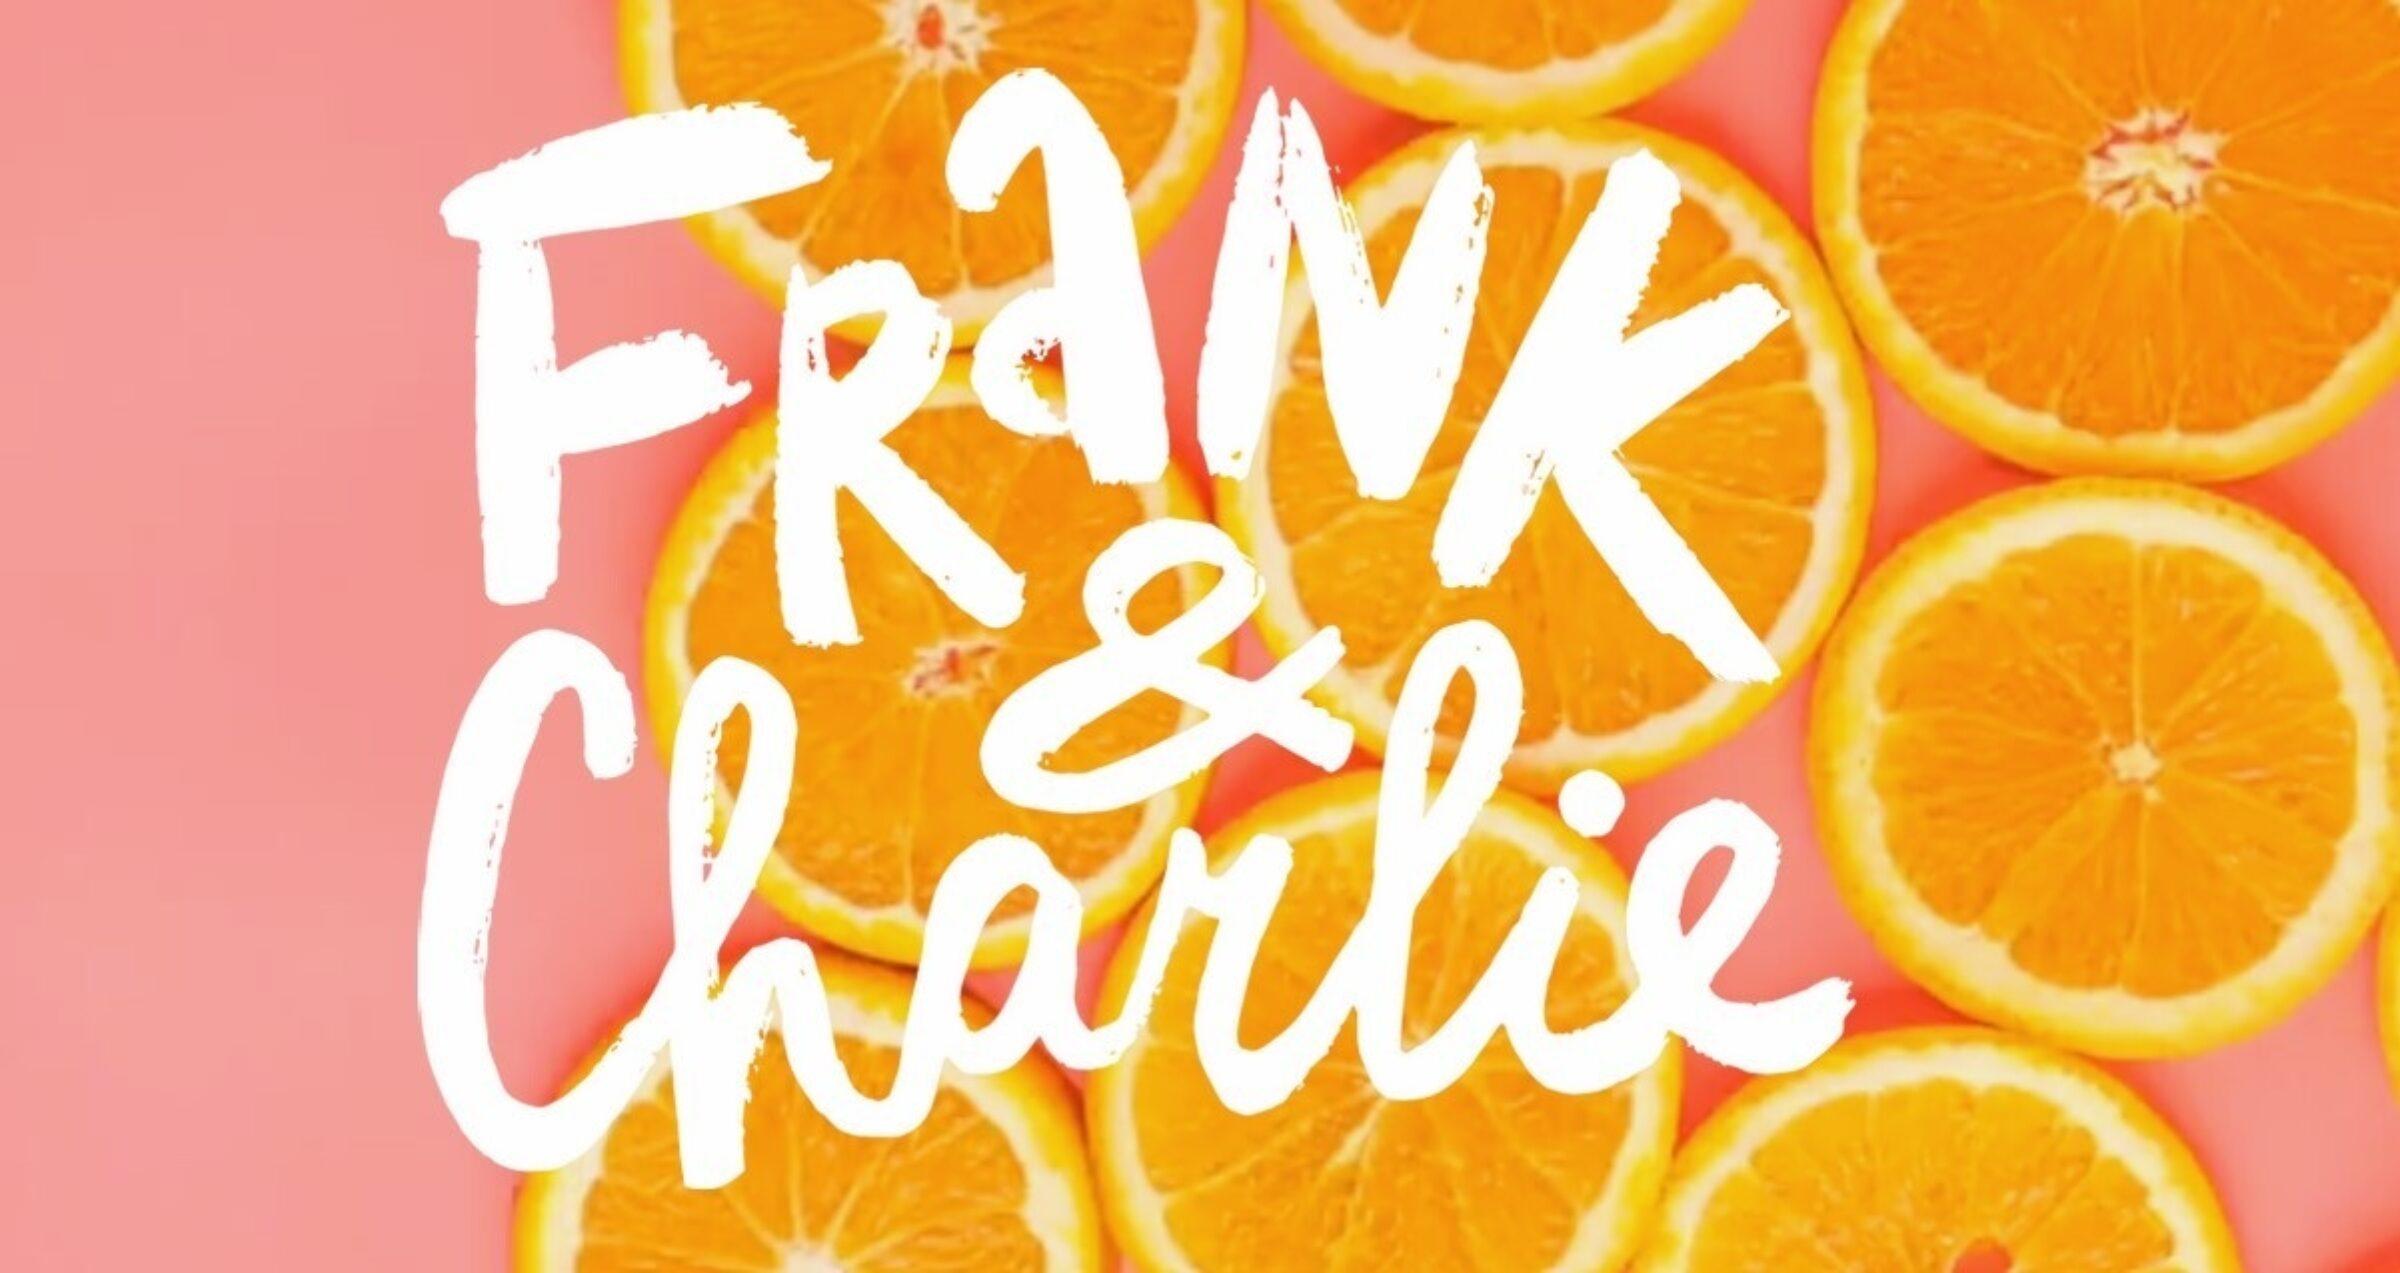 Frank en Charlie